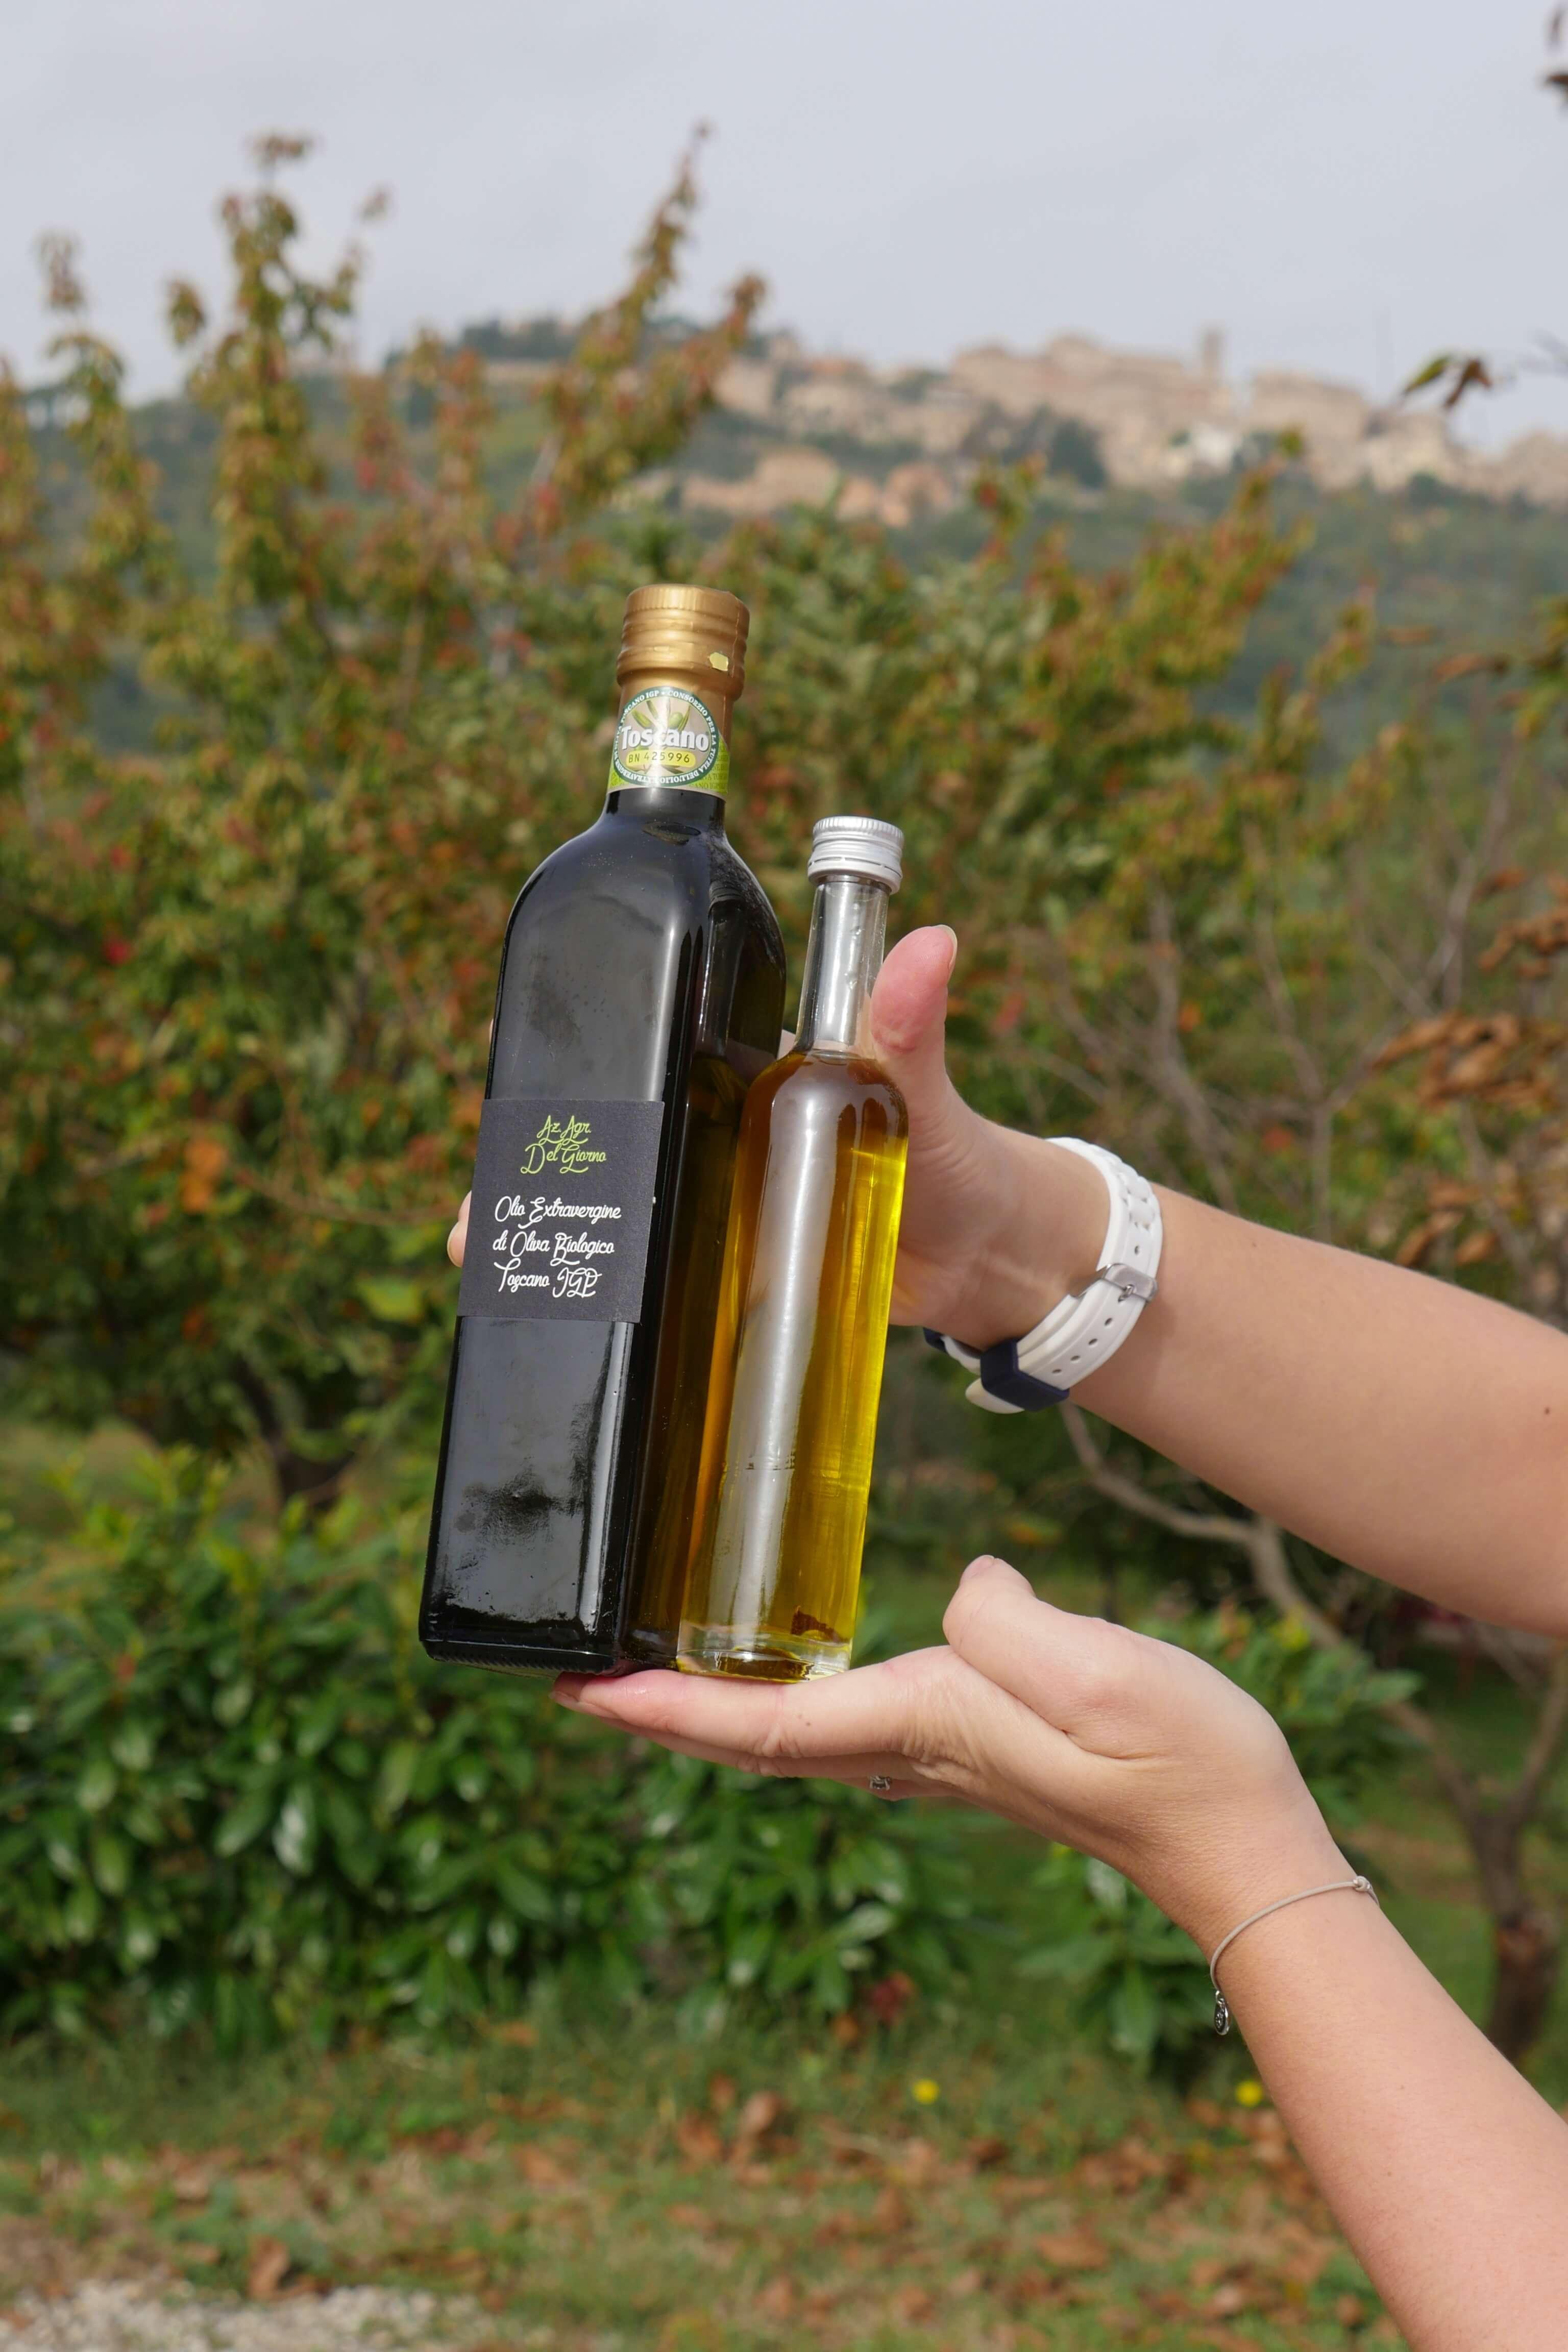 Huile d'olive extra vierge bio - Olio del Giorno - Pauline&Olivier